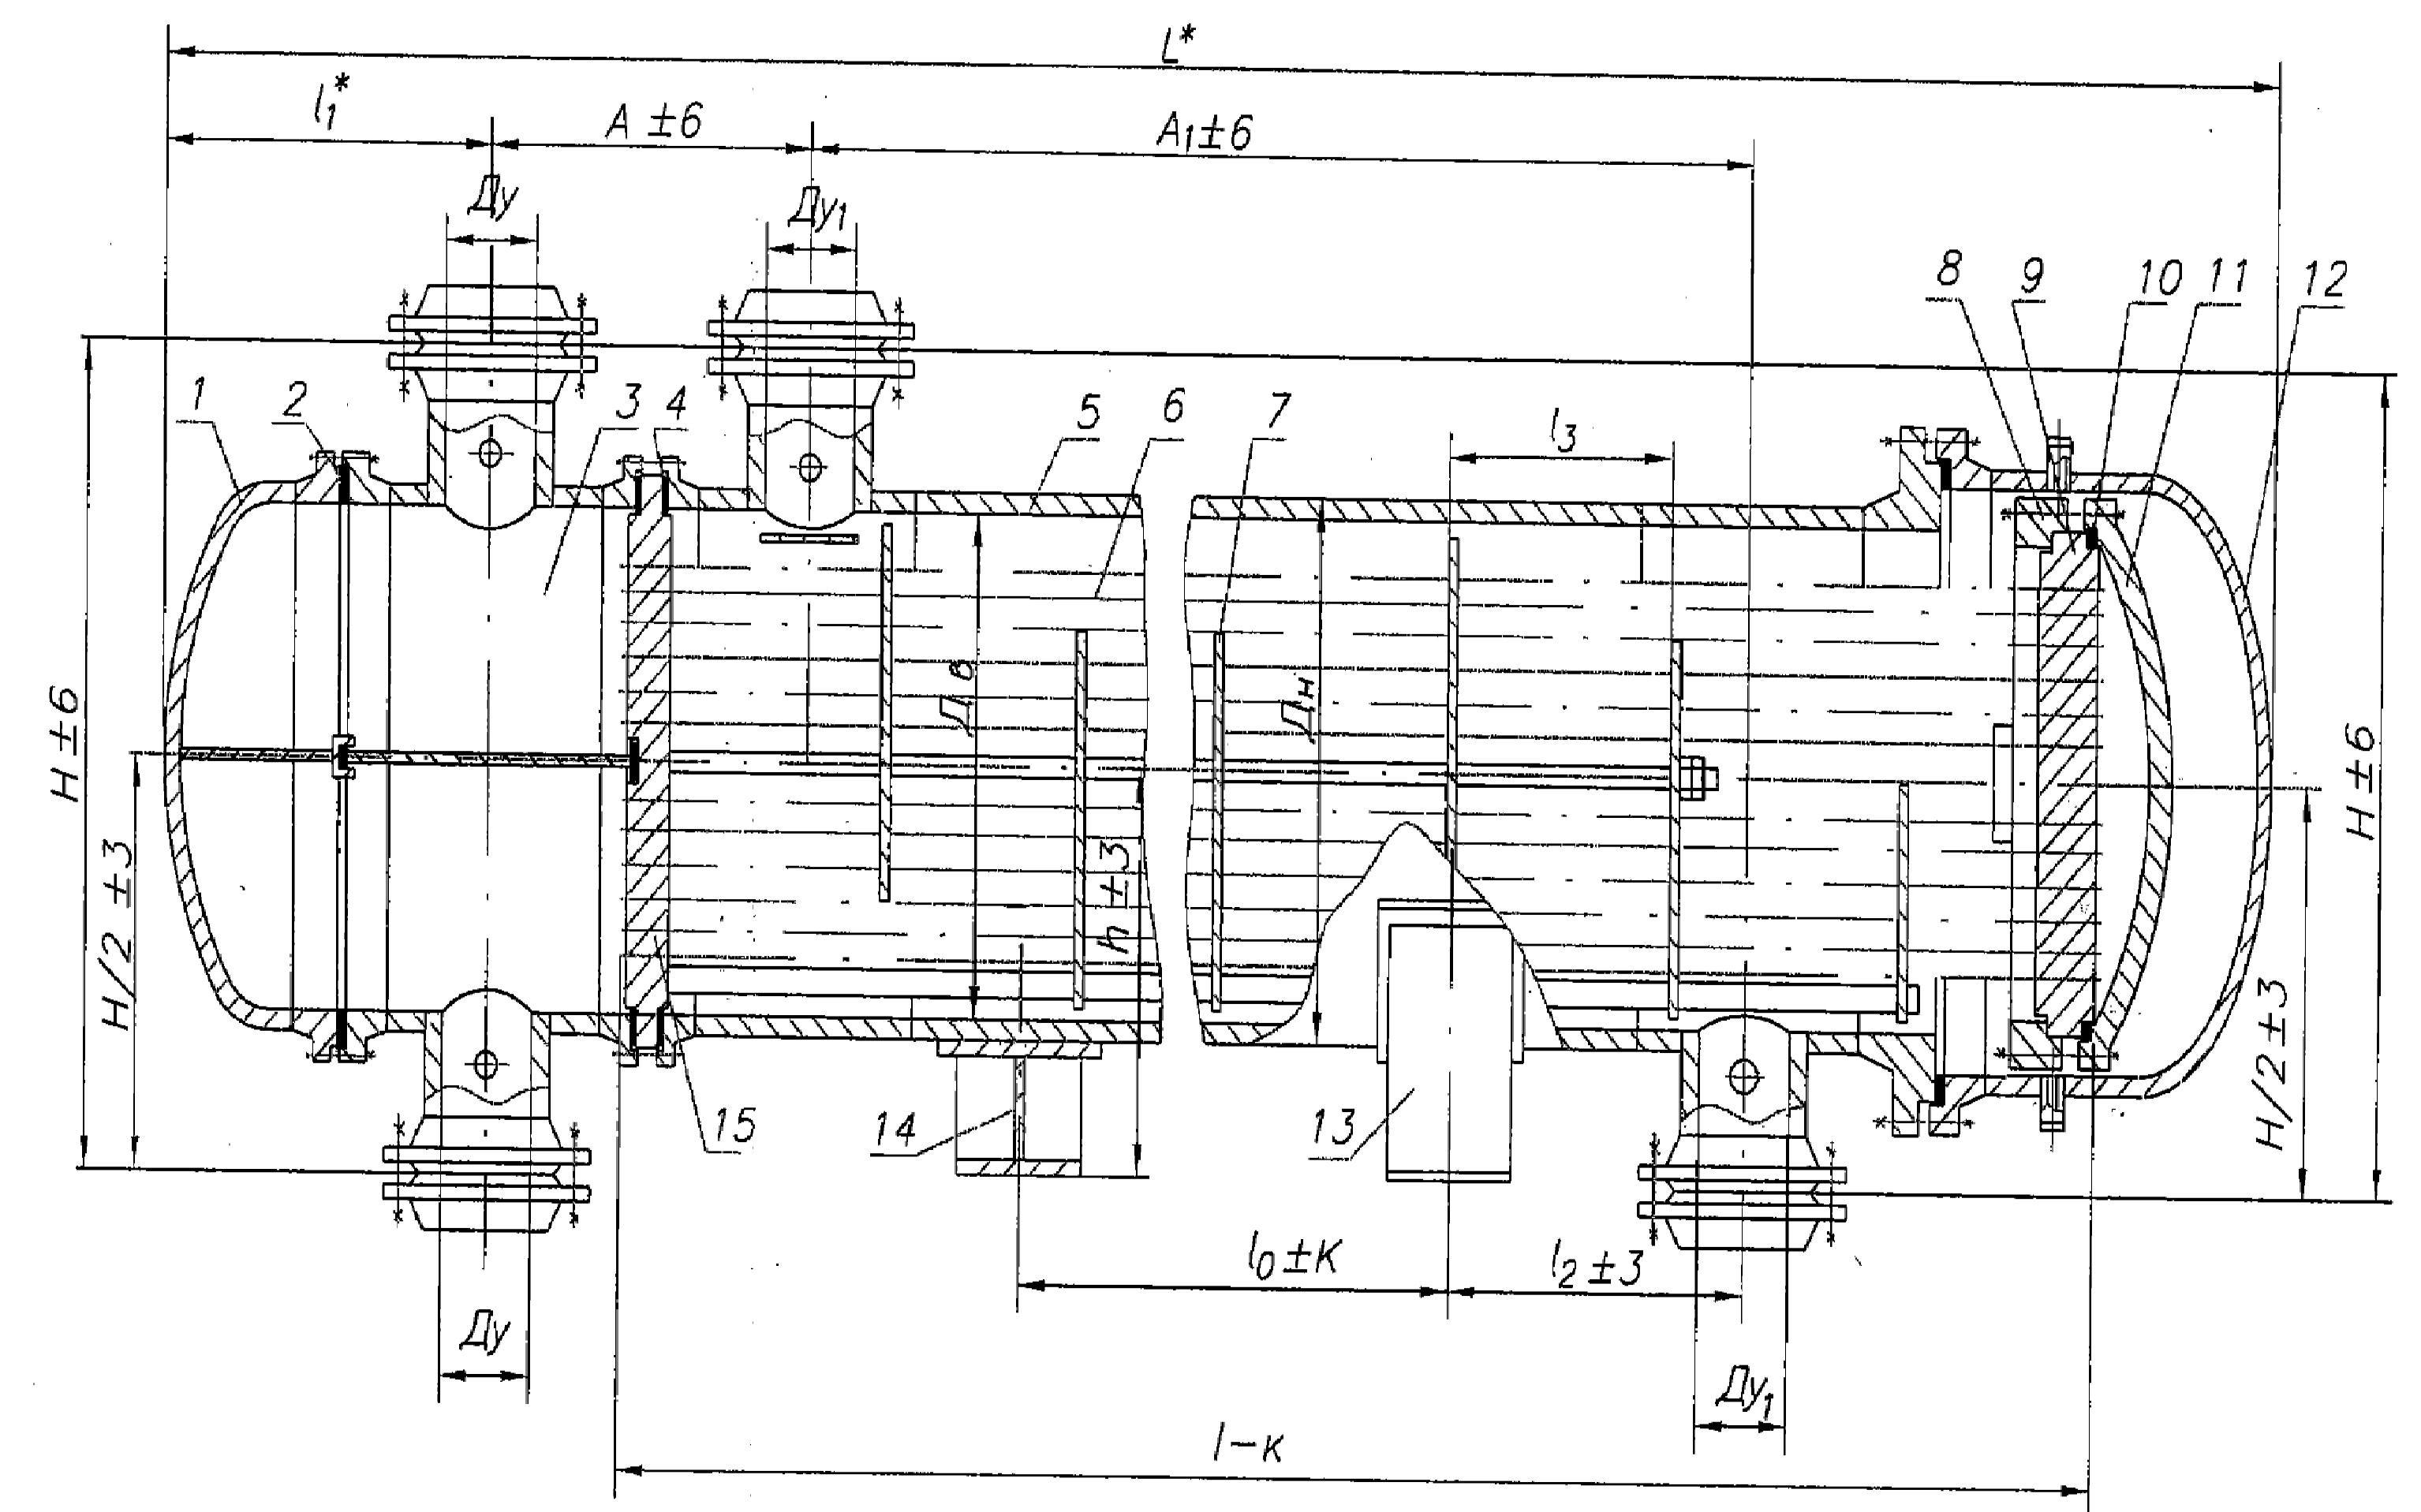 Конденсатор кожухотрубный (кожухотрубчатый) типа ККВ Киров Кожухотрубный испаритель Alfa Laval DED 1100 Дзержинск